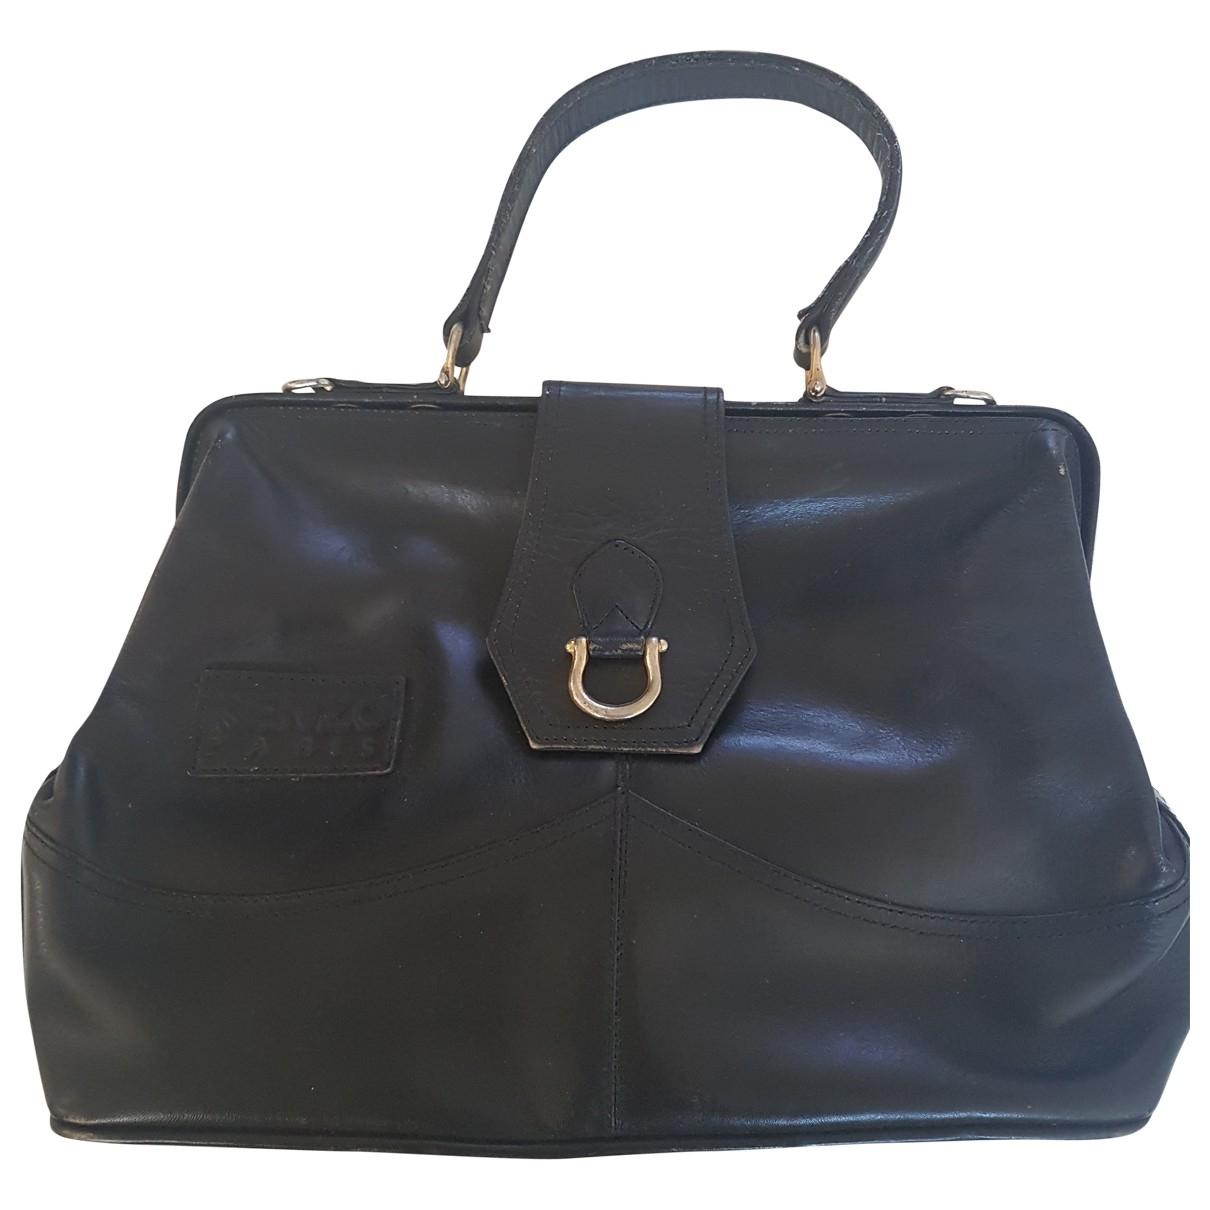 Kenzo \N Handtasche in  Schwarz Leder